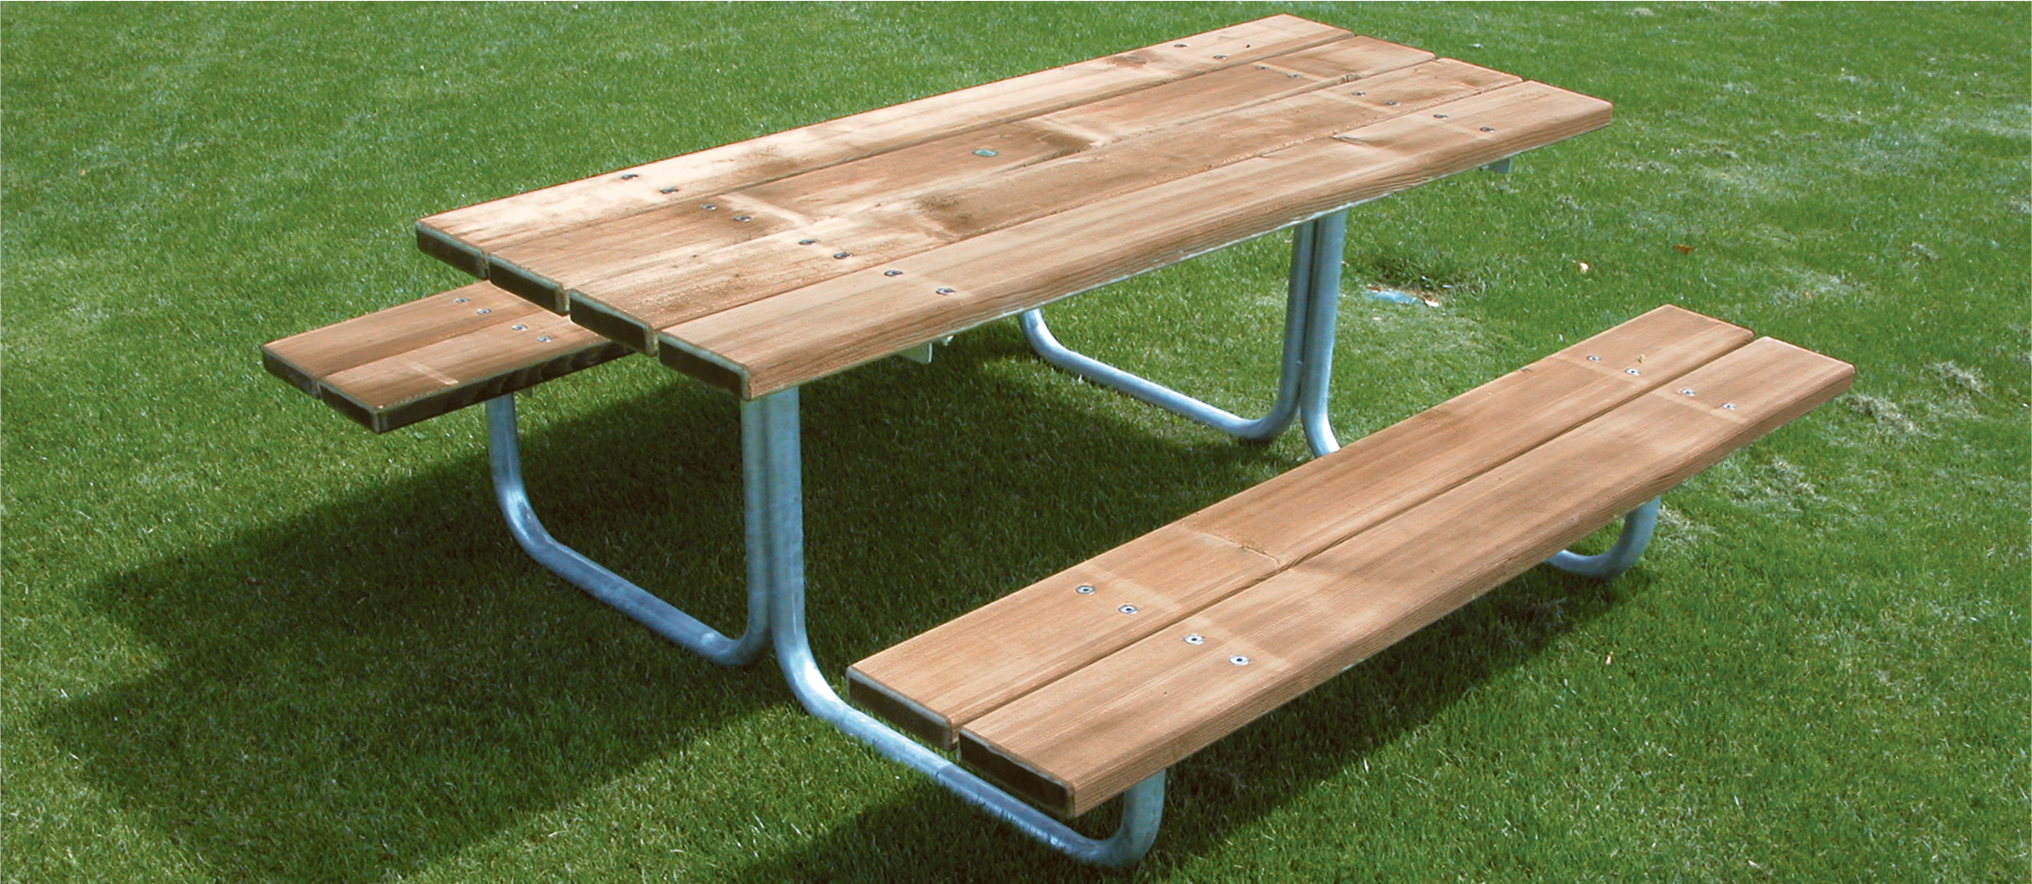 picknicktische f r kinder fuchs thun. Black Bedroom Furniture Sets. Home Design Ideas